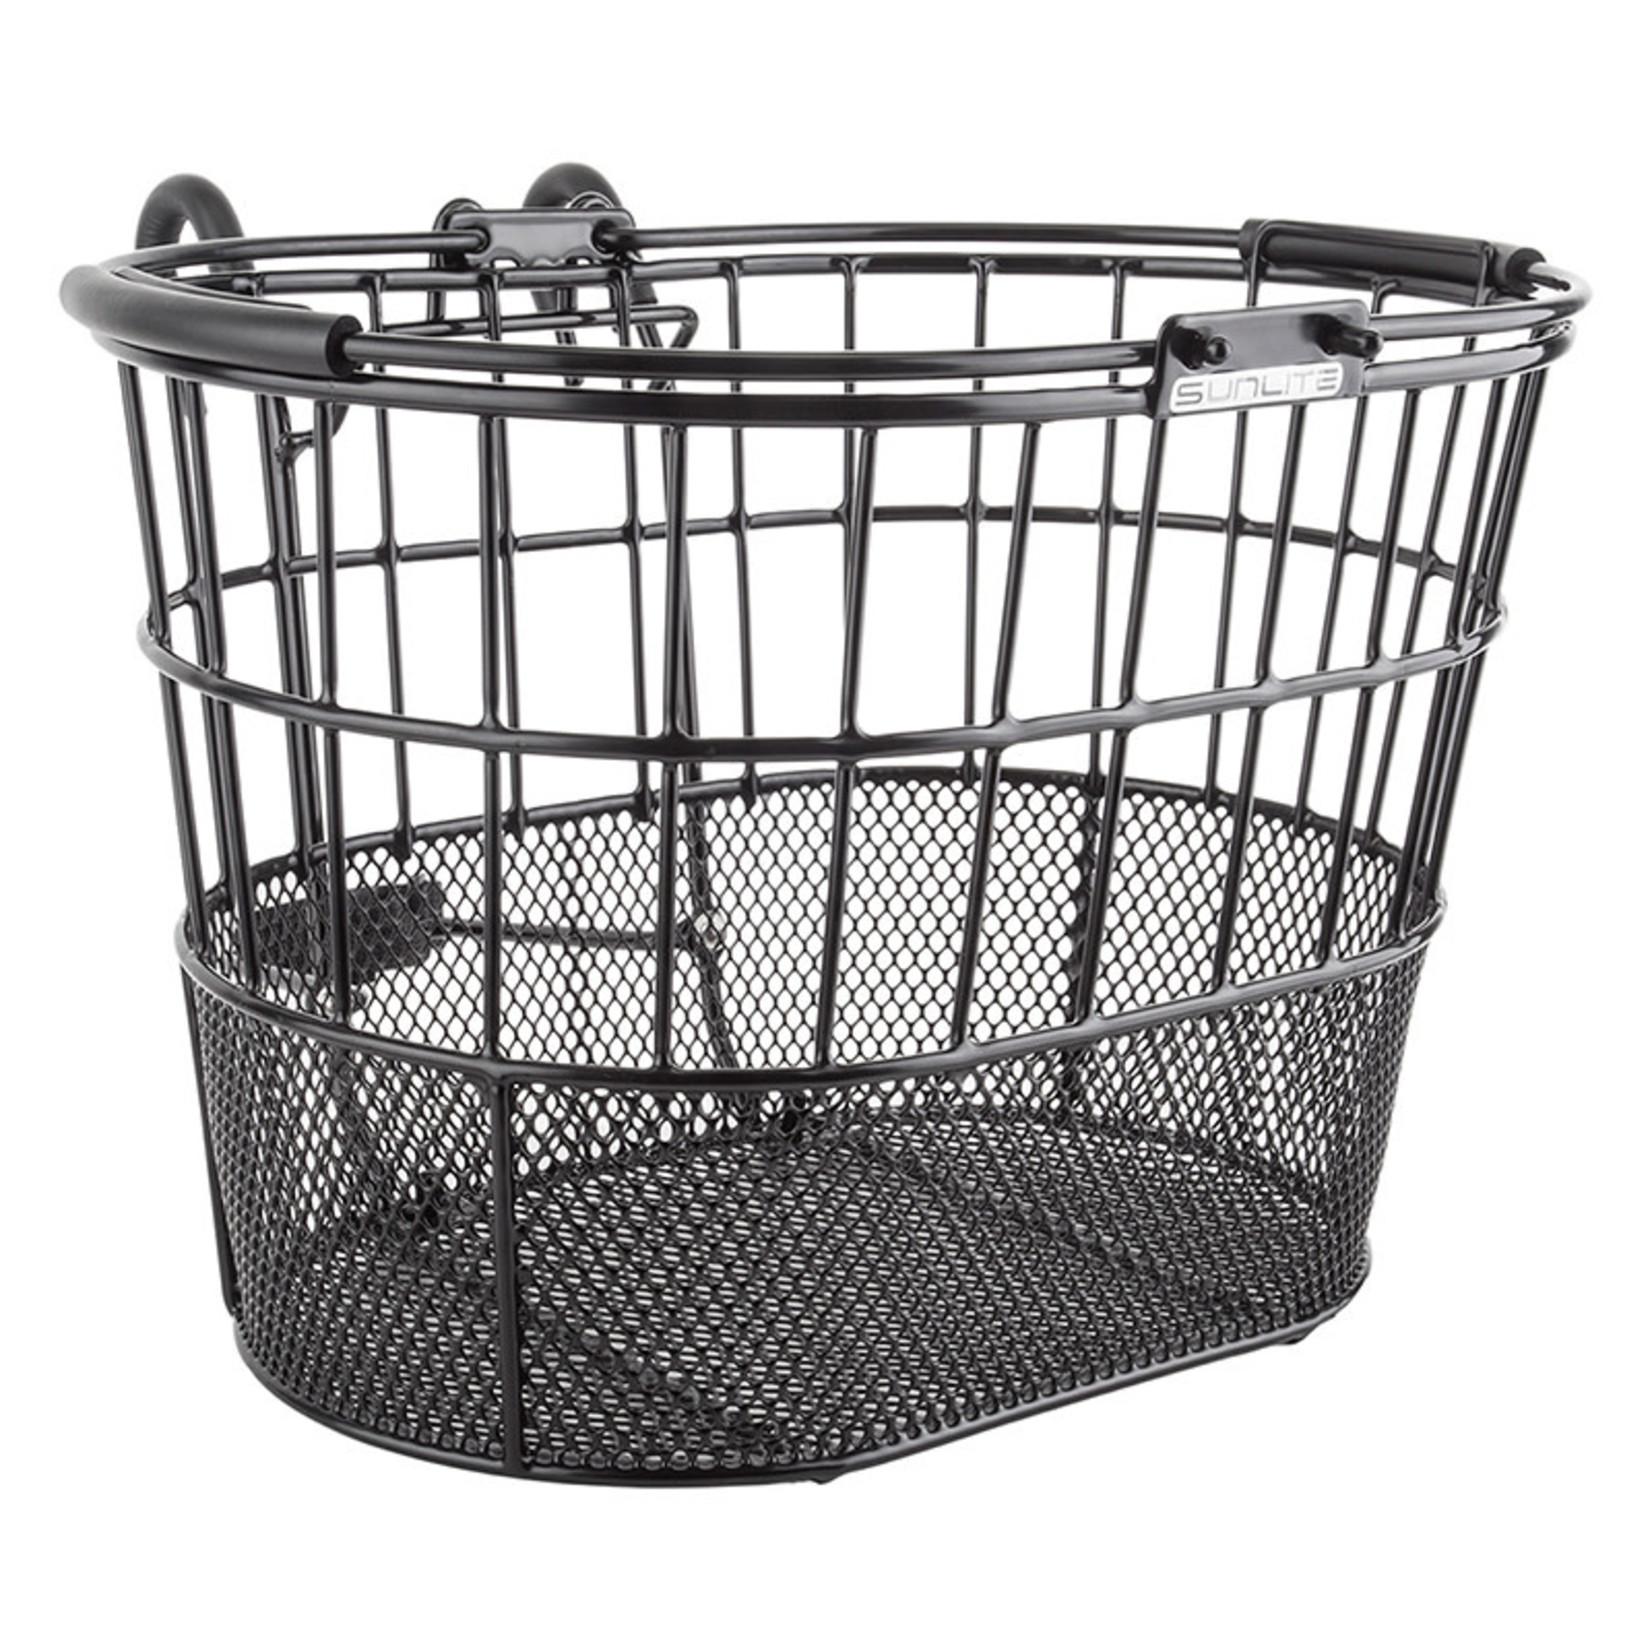 Standard Oval Mesh Bottom Lift-Off Black